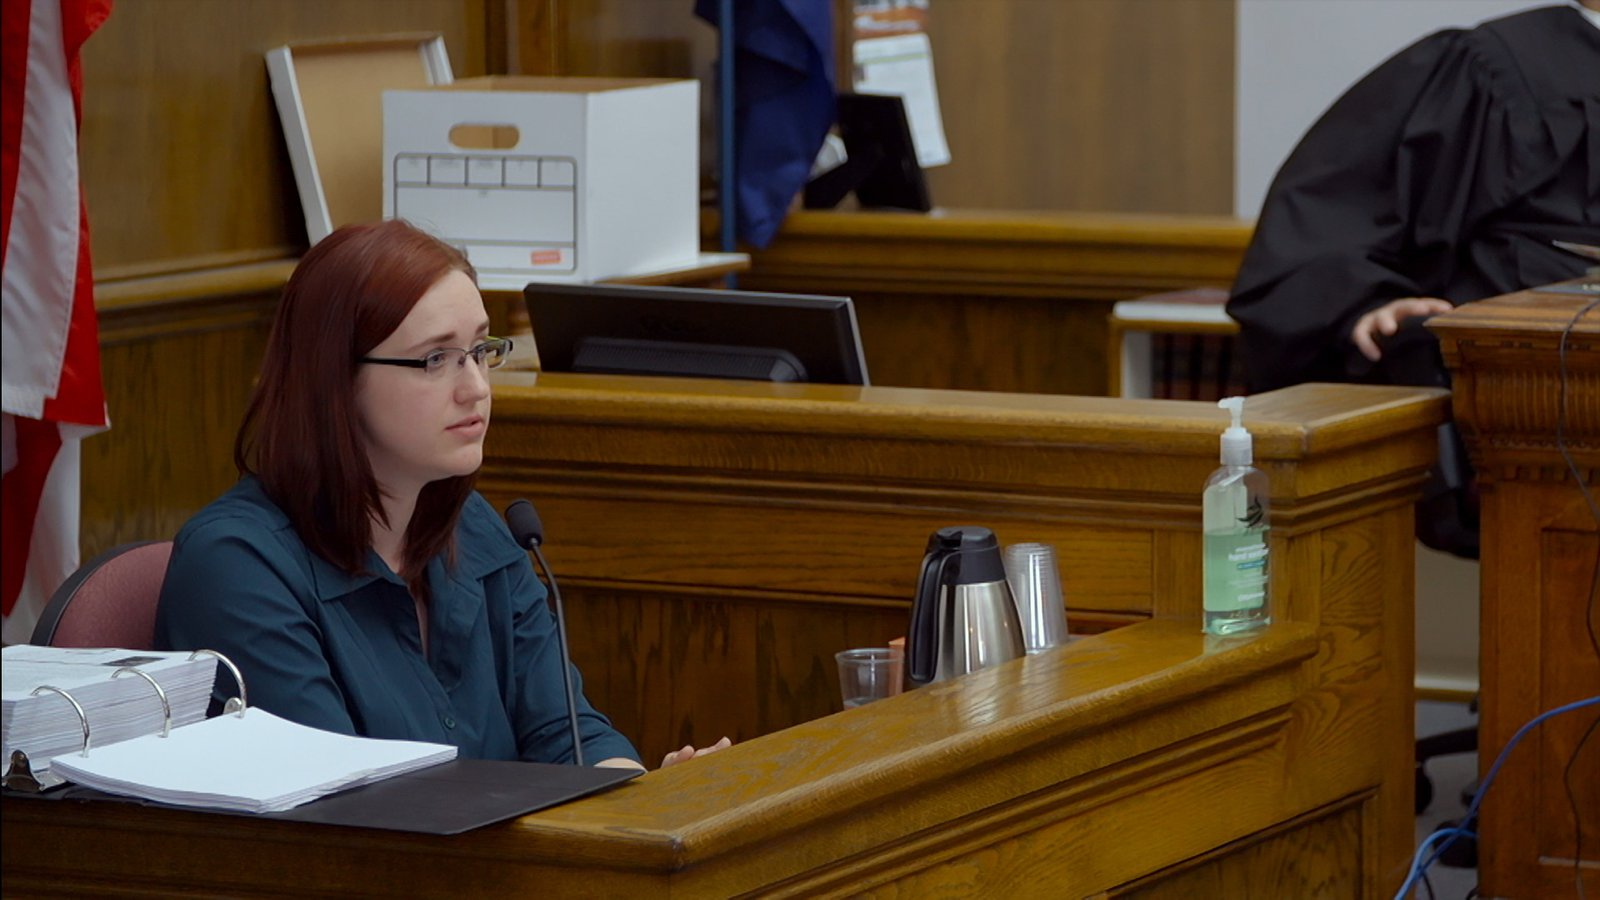 Dark Money - Montana State Legislator on Trial